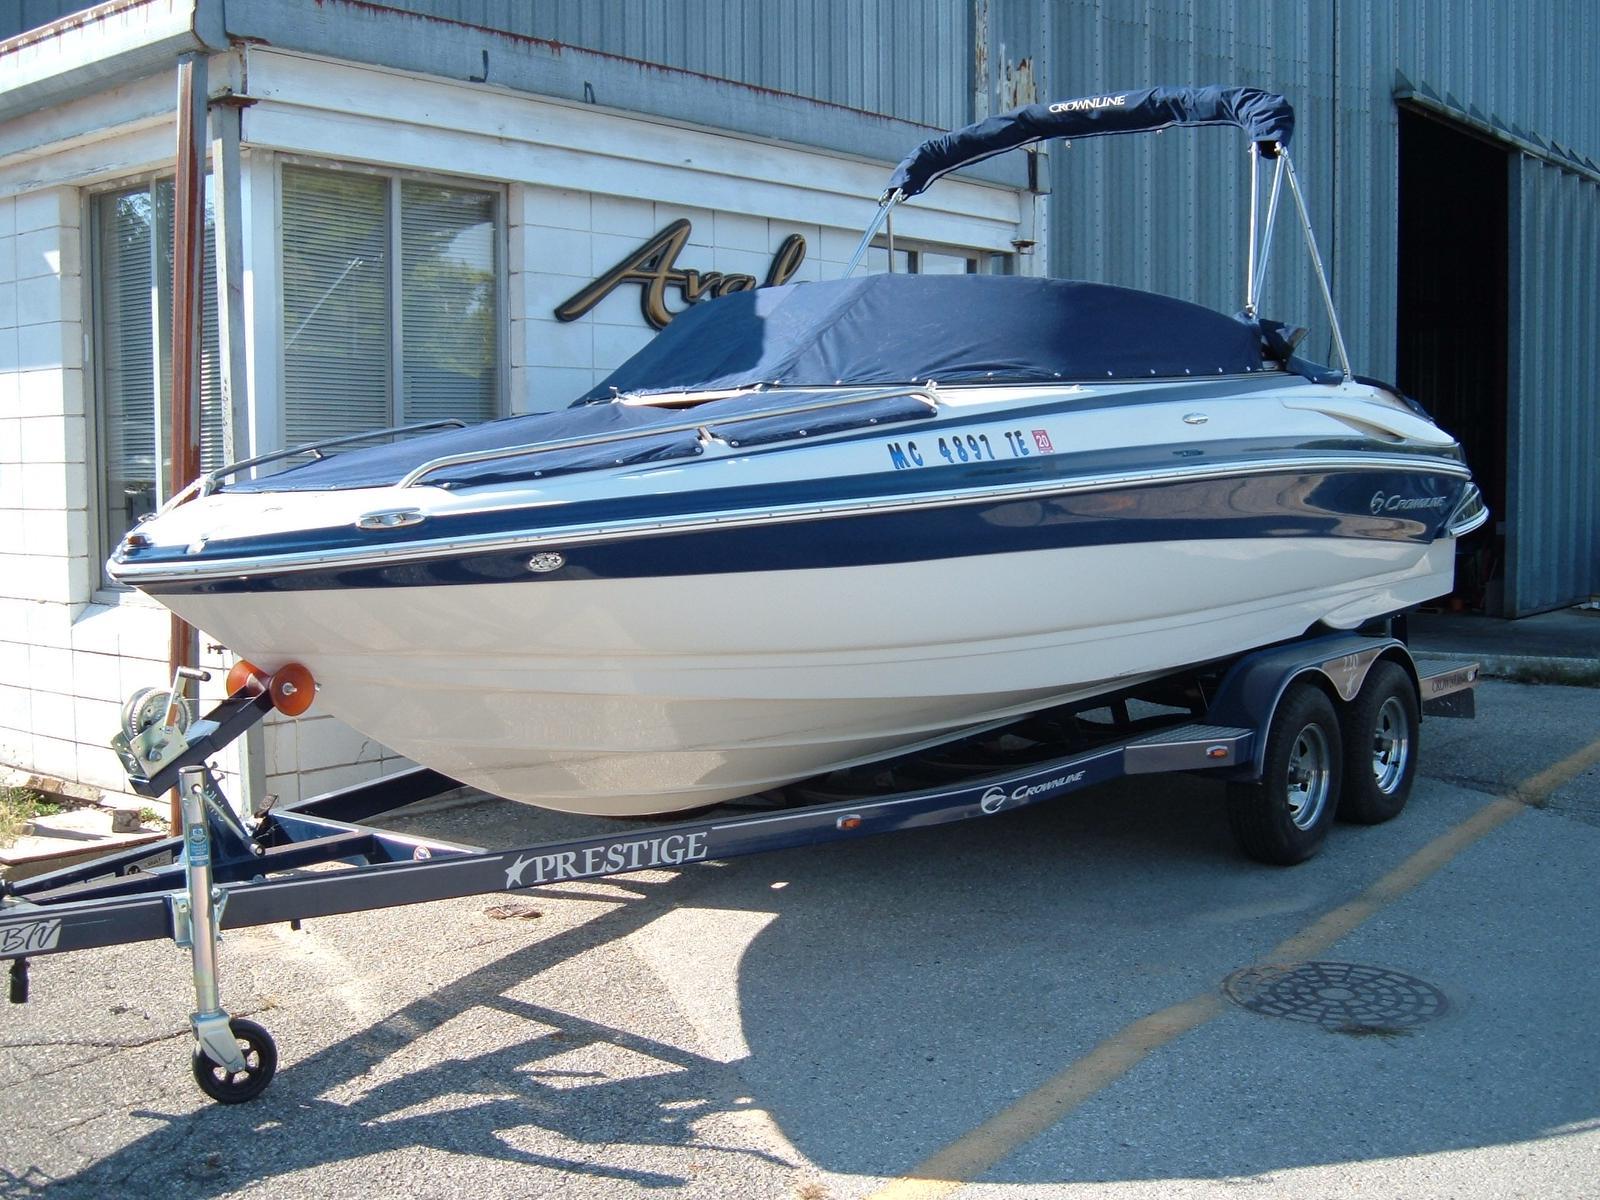 2008 Crownline 220LS for sale in Leland, MI  Stander Marine